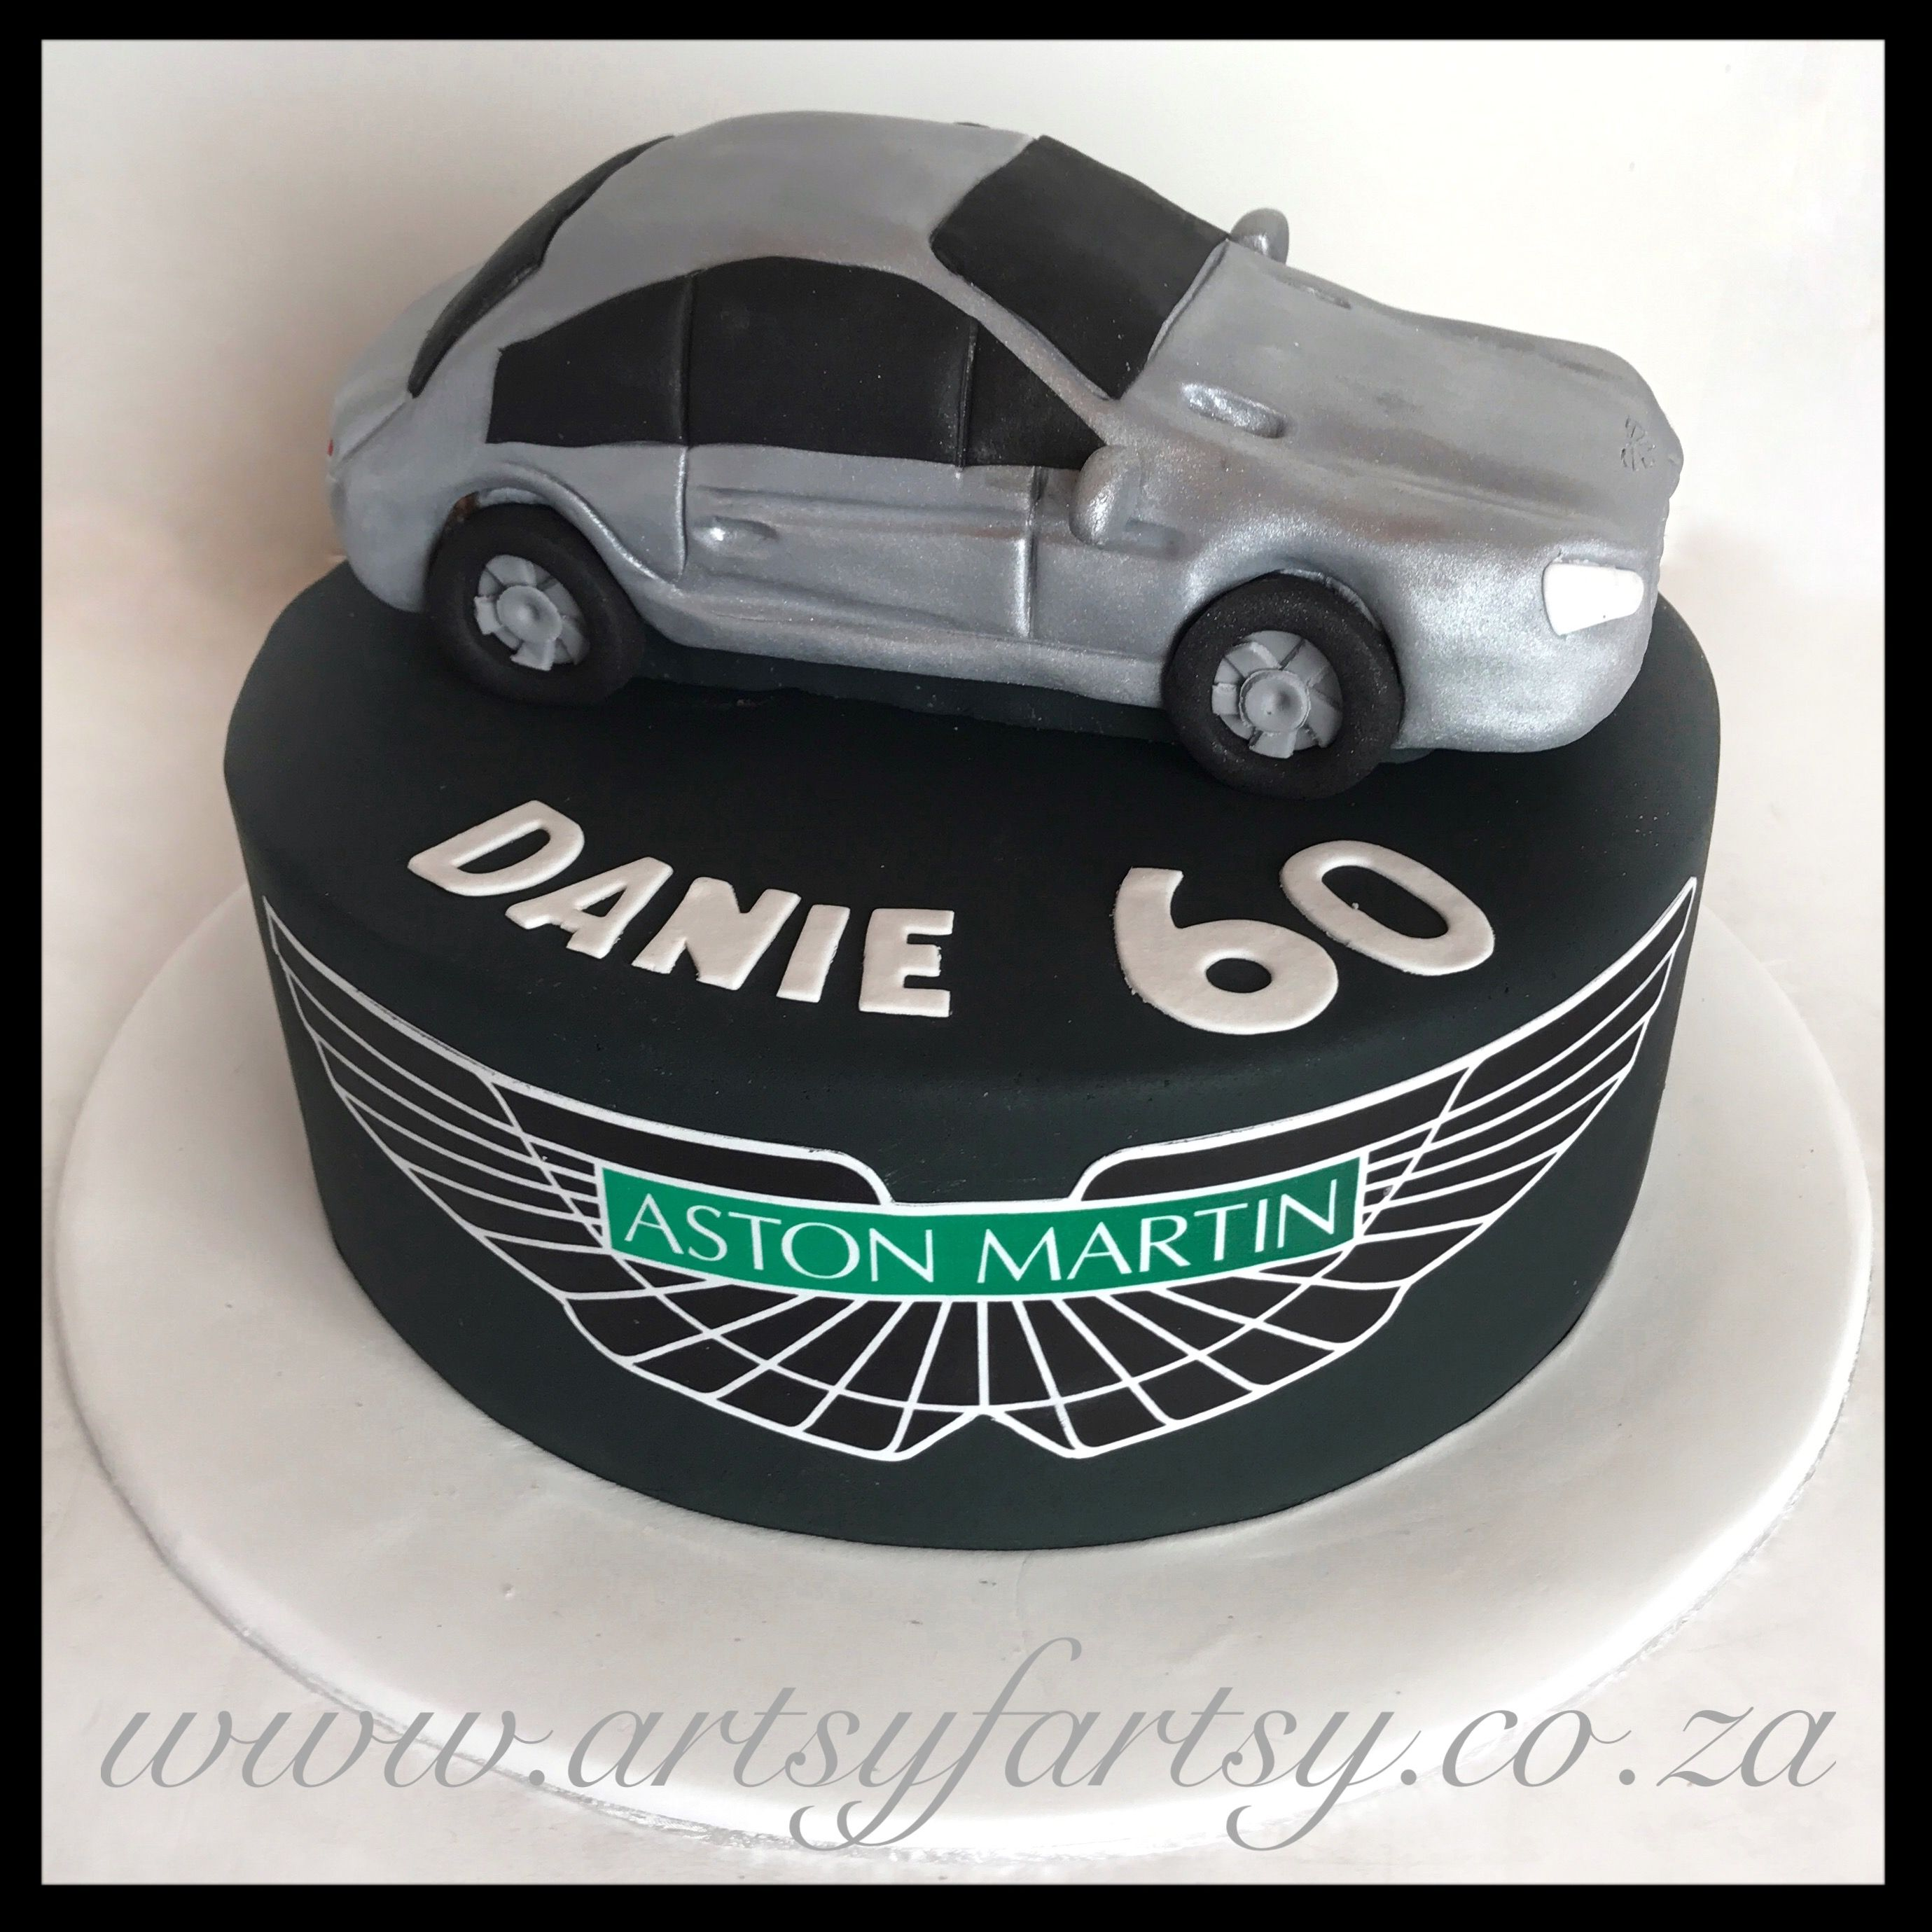 Aston Martin Cake Astonmartincake Car Truck And Motorbike Cakes